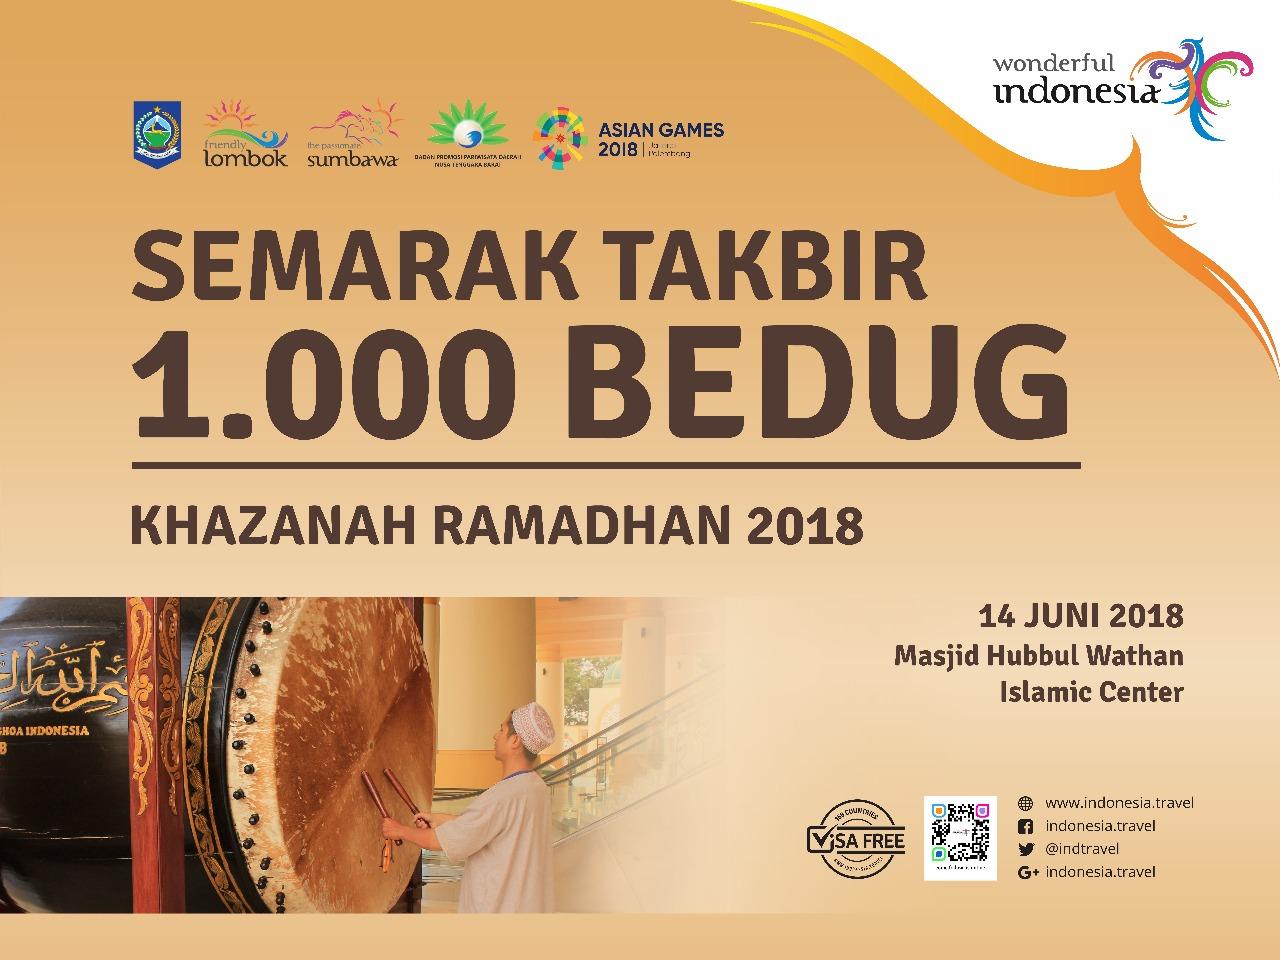 Photo of MURI Tabuh 1000 Bedug, Menutup Rangkaian Pesona Khazanah Ramadhan